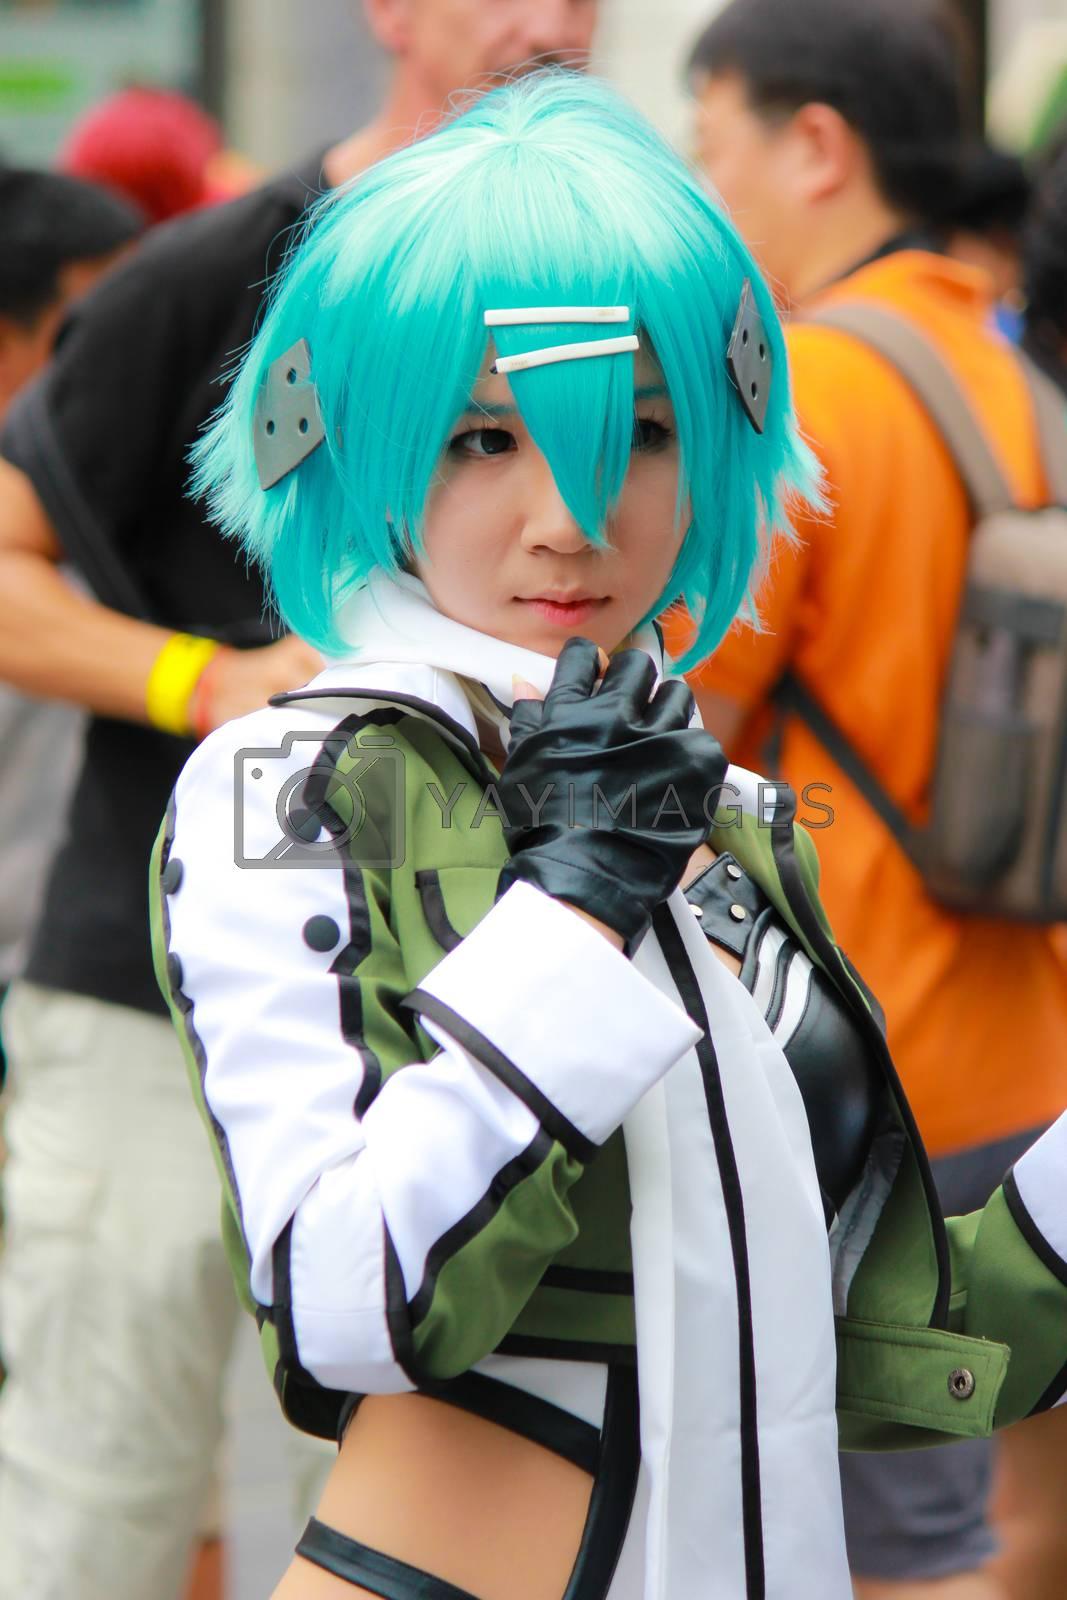 Bangkok - Aug 31: An unidentified Japanese anime cosplay Sinon pose  on August 31, 2014 at Central World, Bangkok, Thailand.